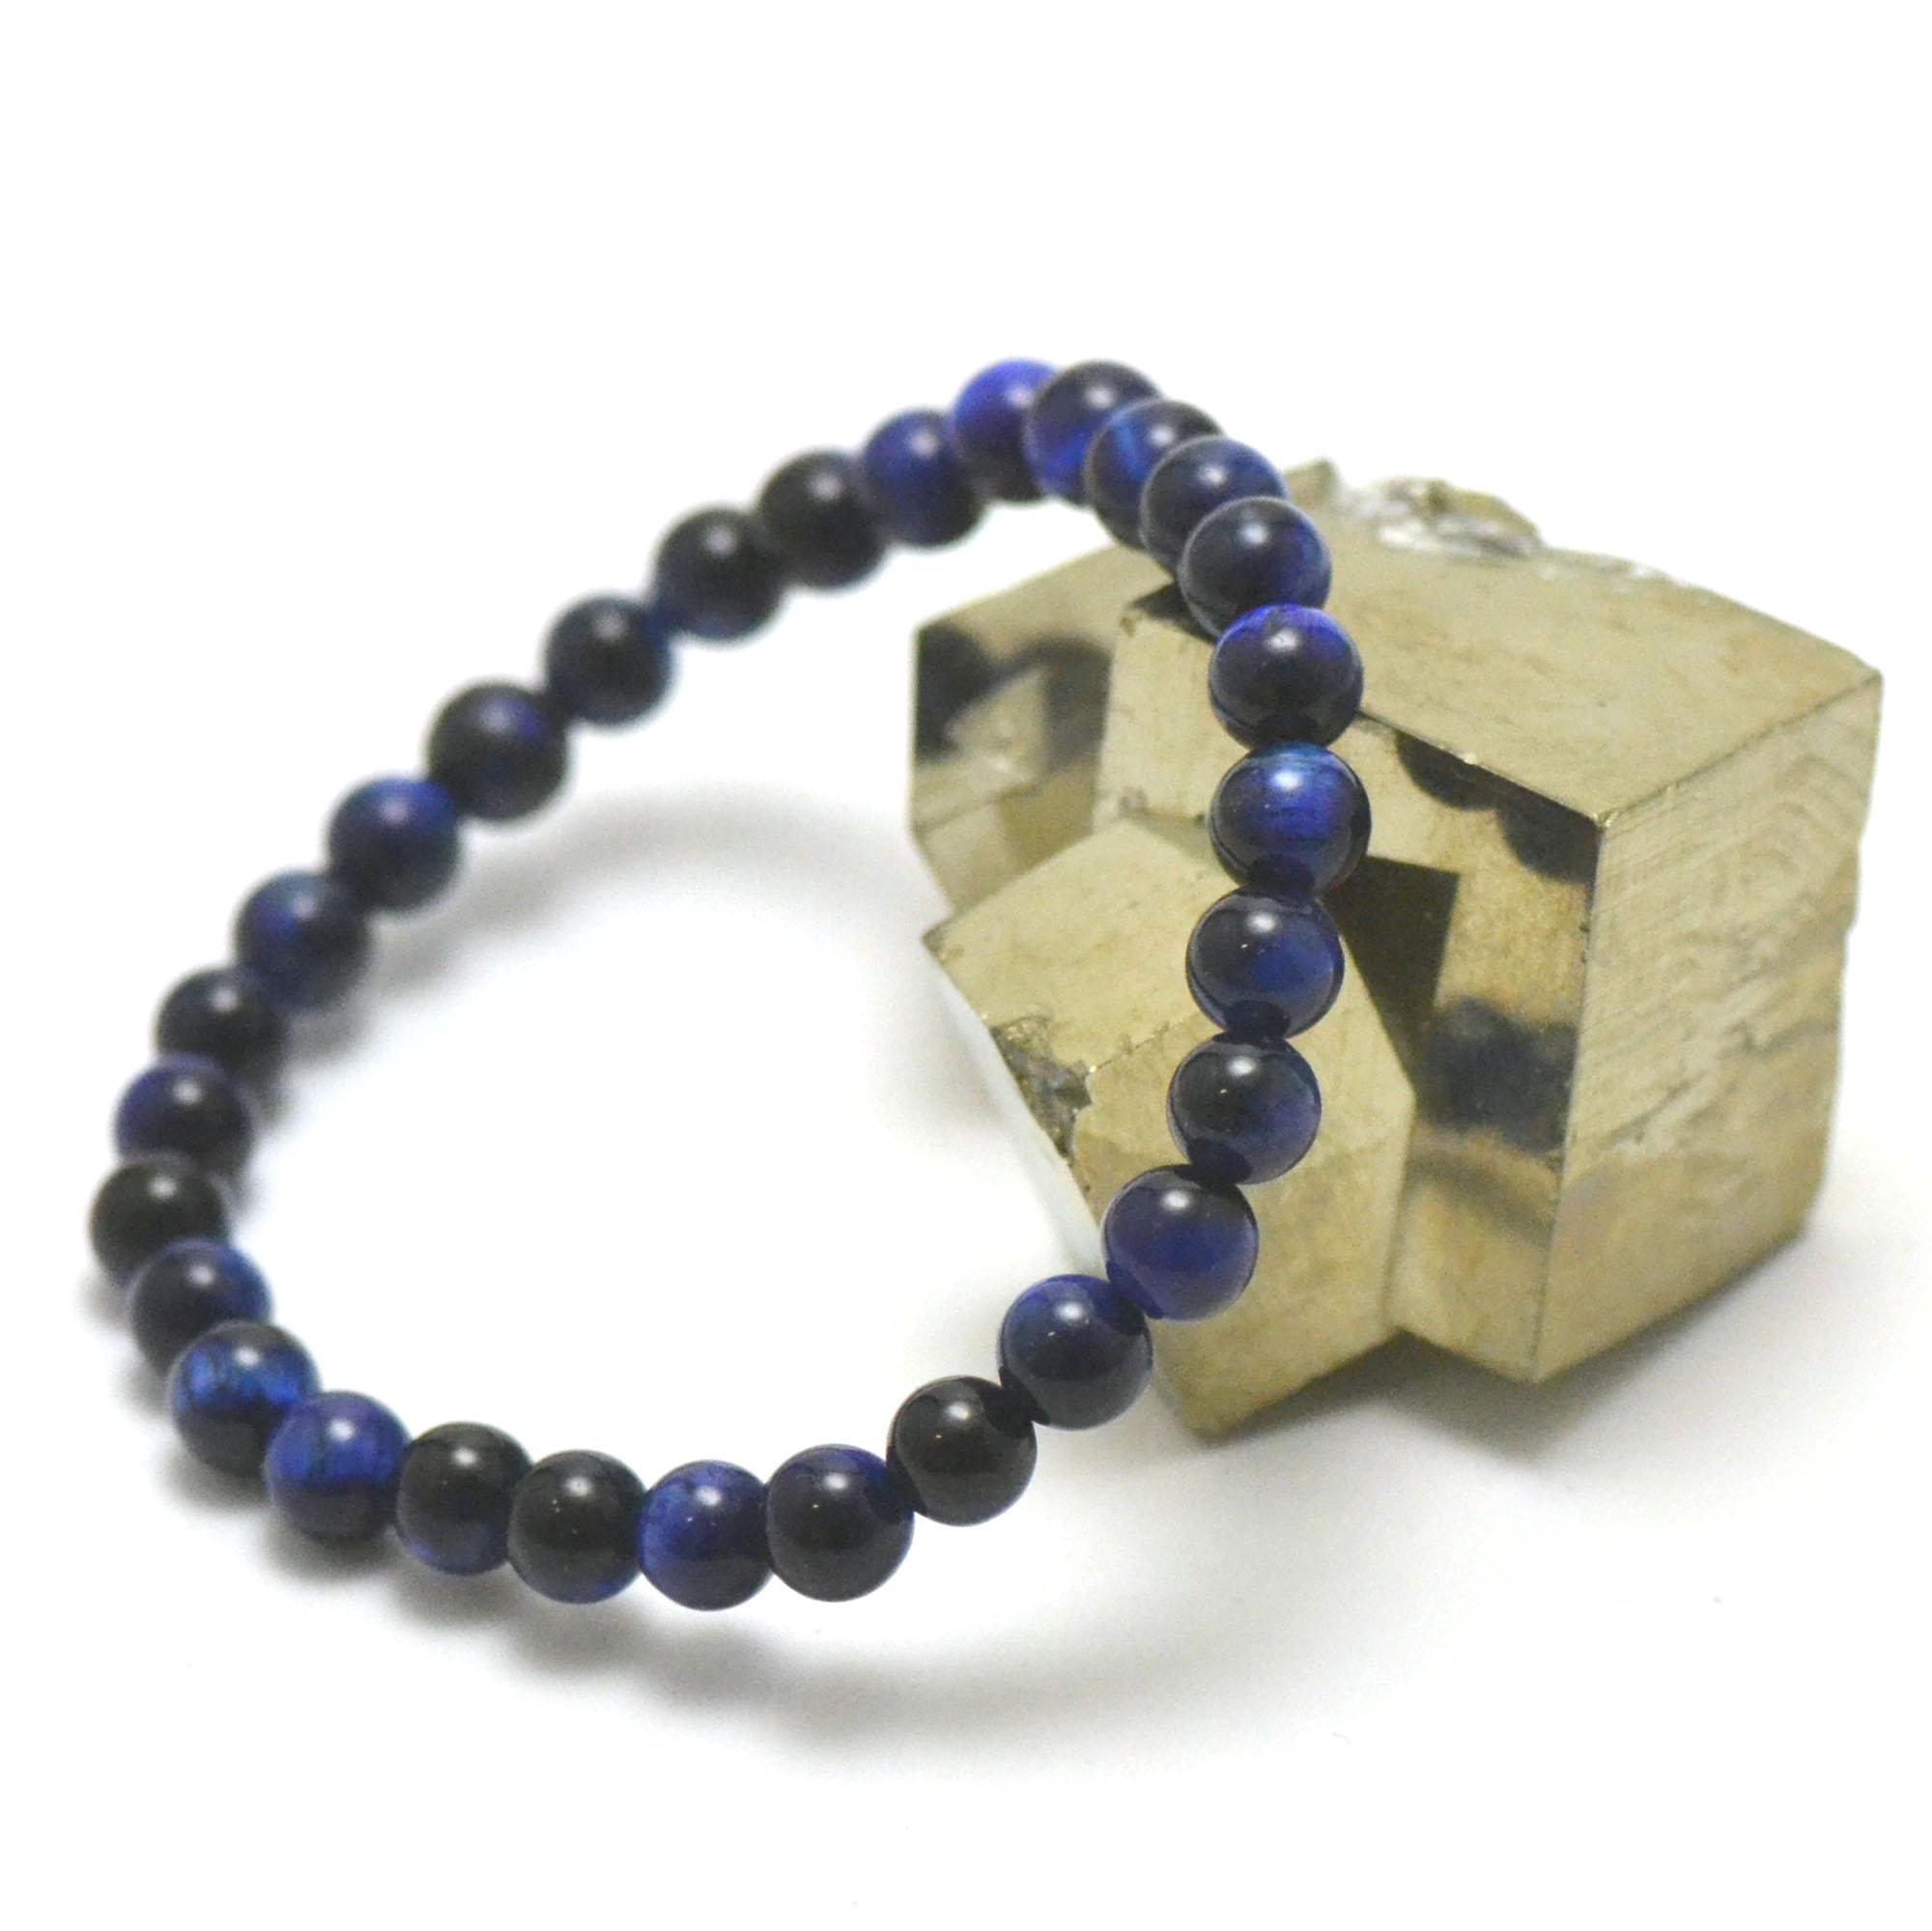 Bracelet oeil de tigre bleu perle ronde 6 mm